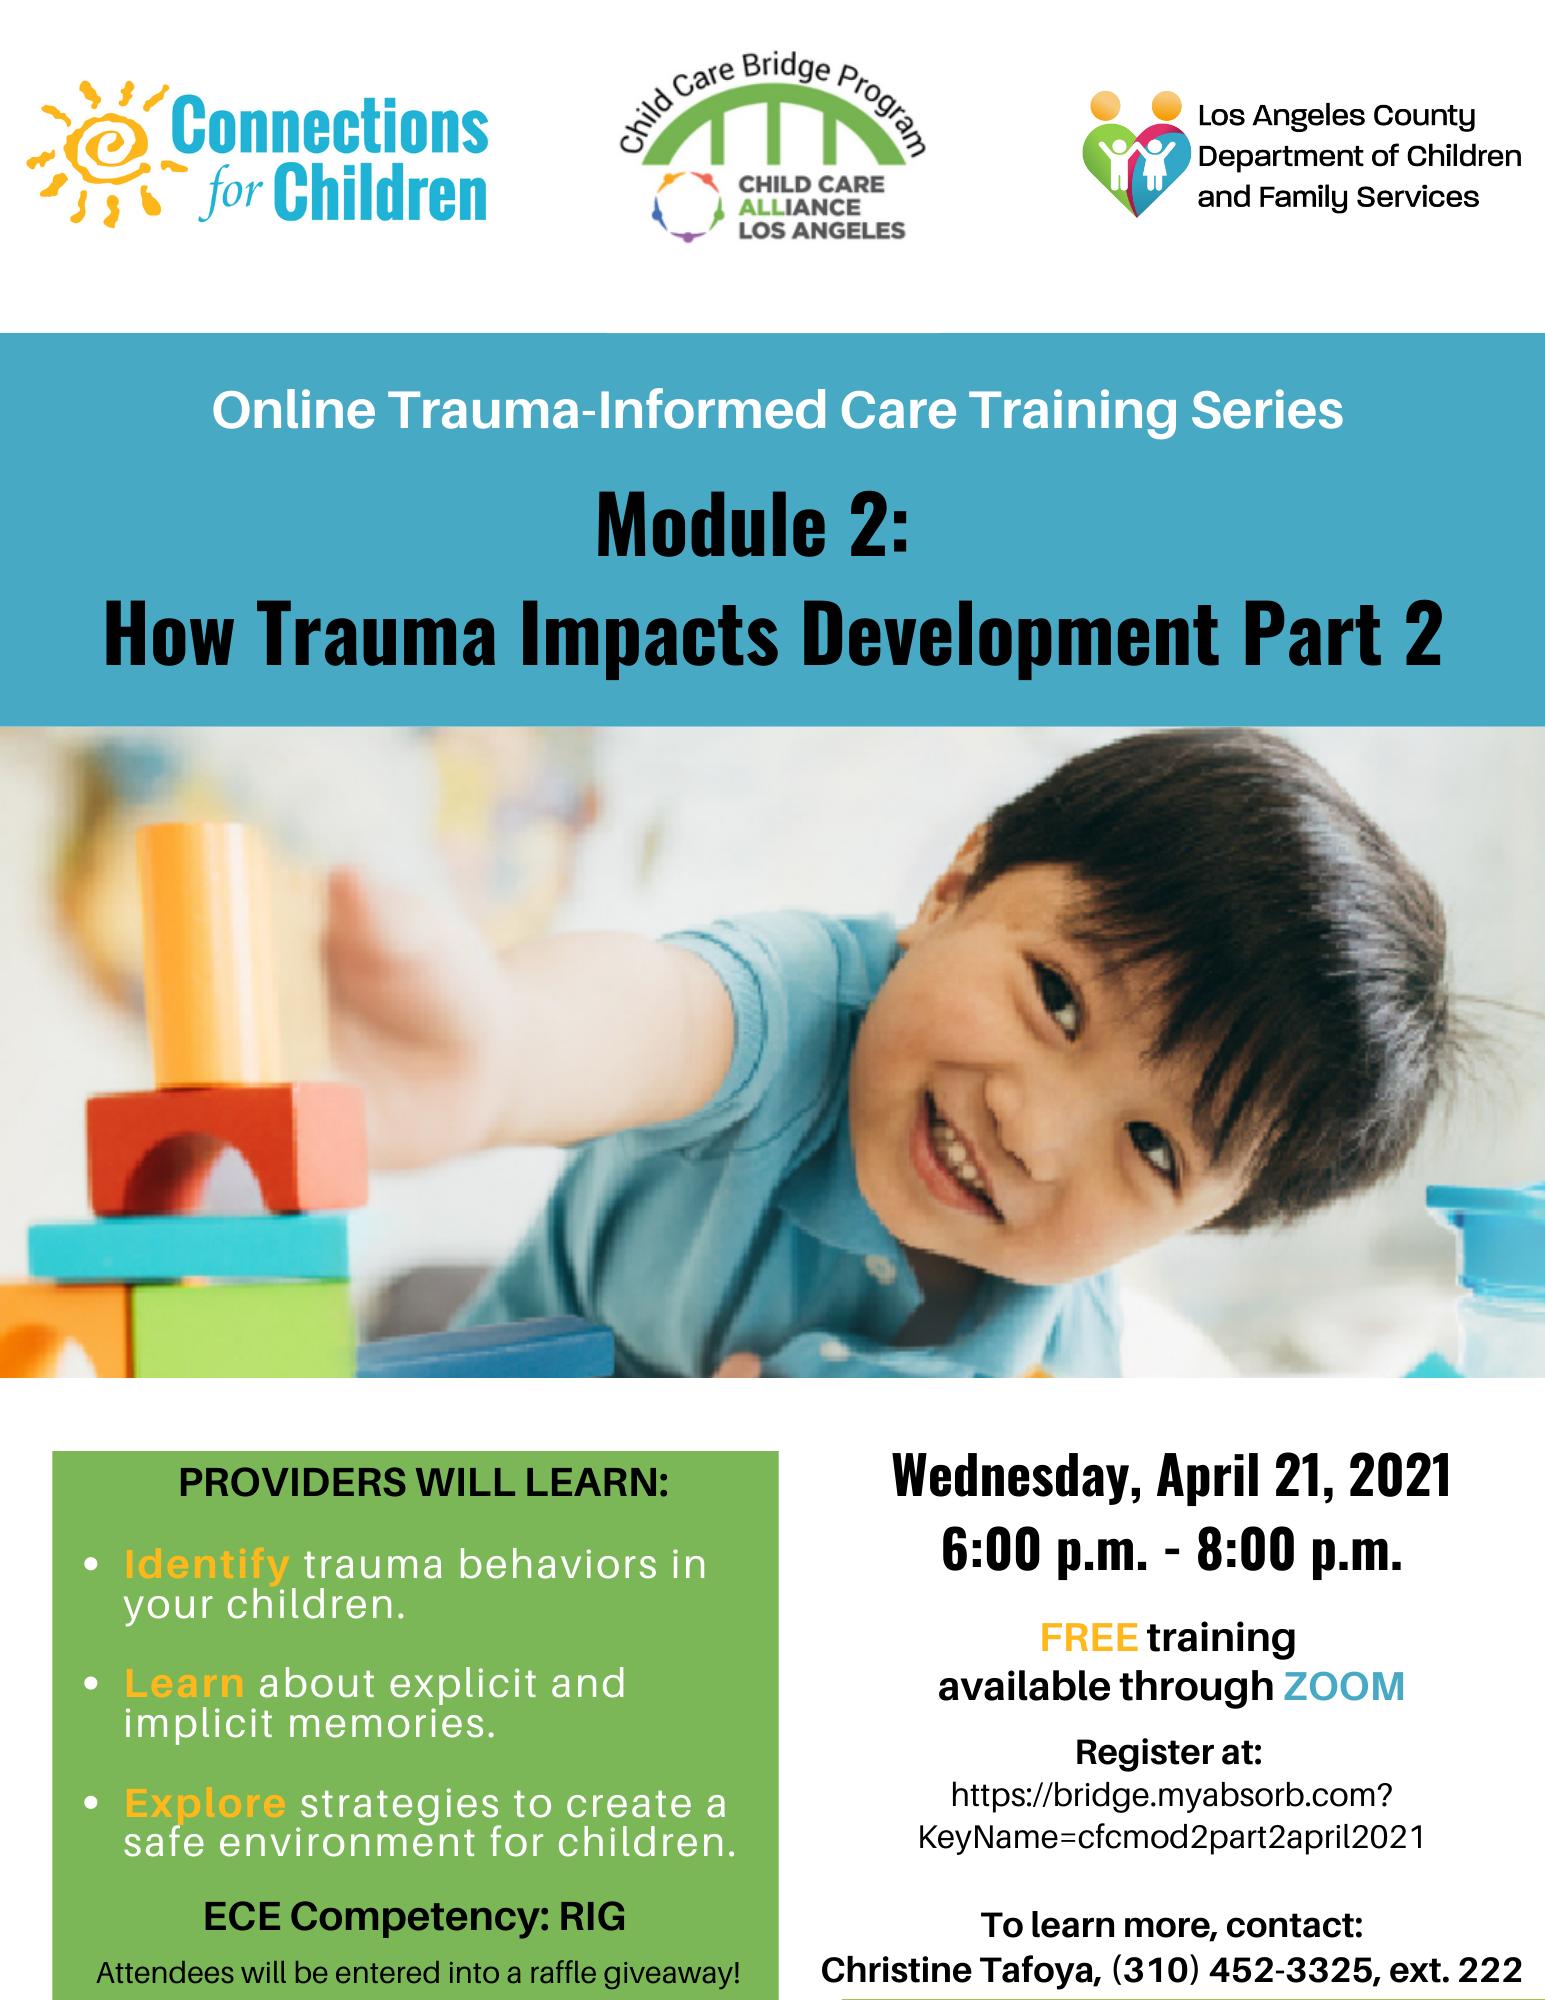 How Trauma Impacts Development, Part 2